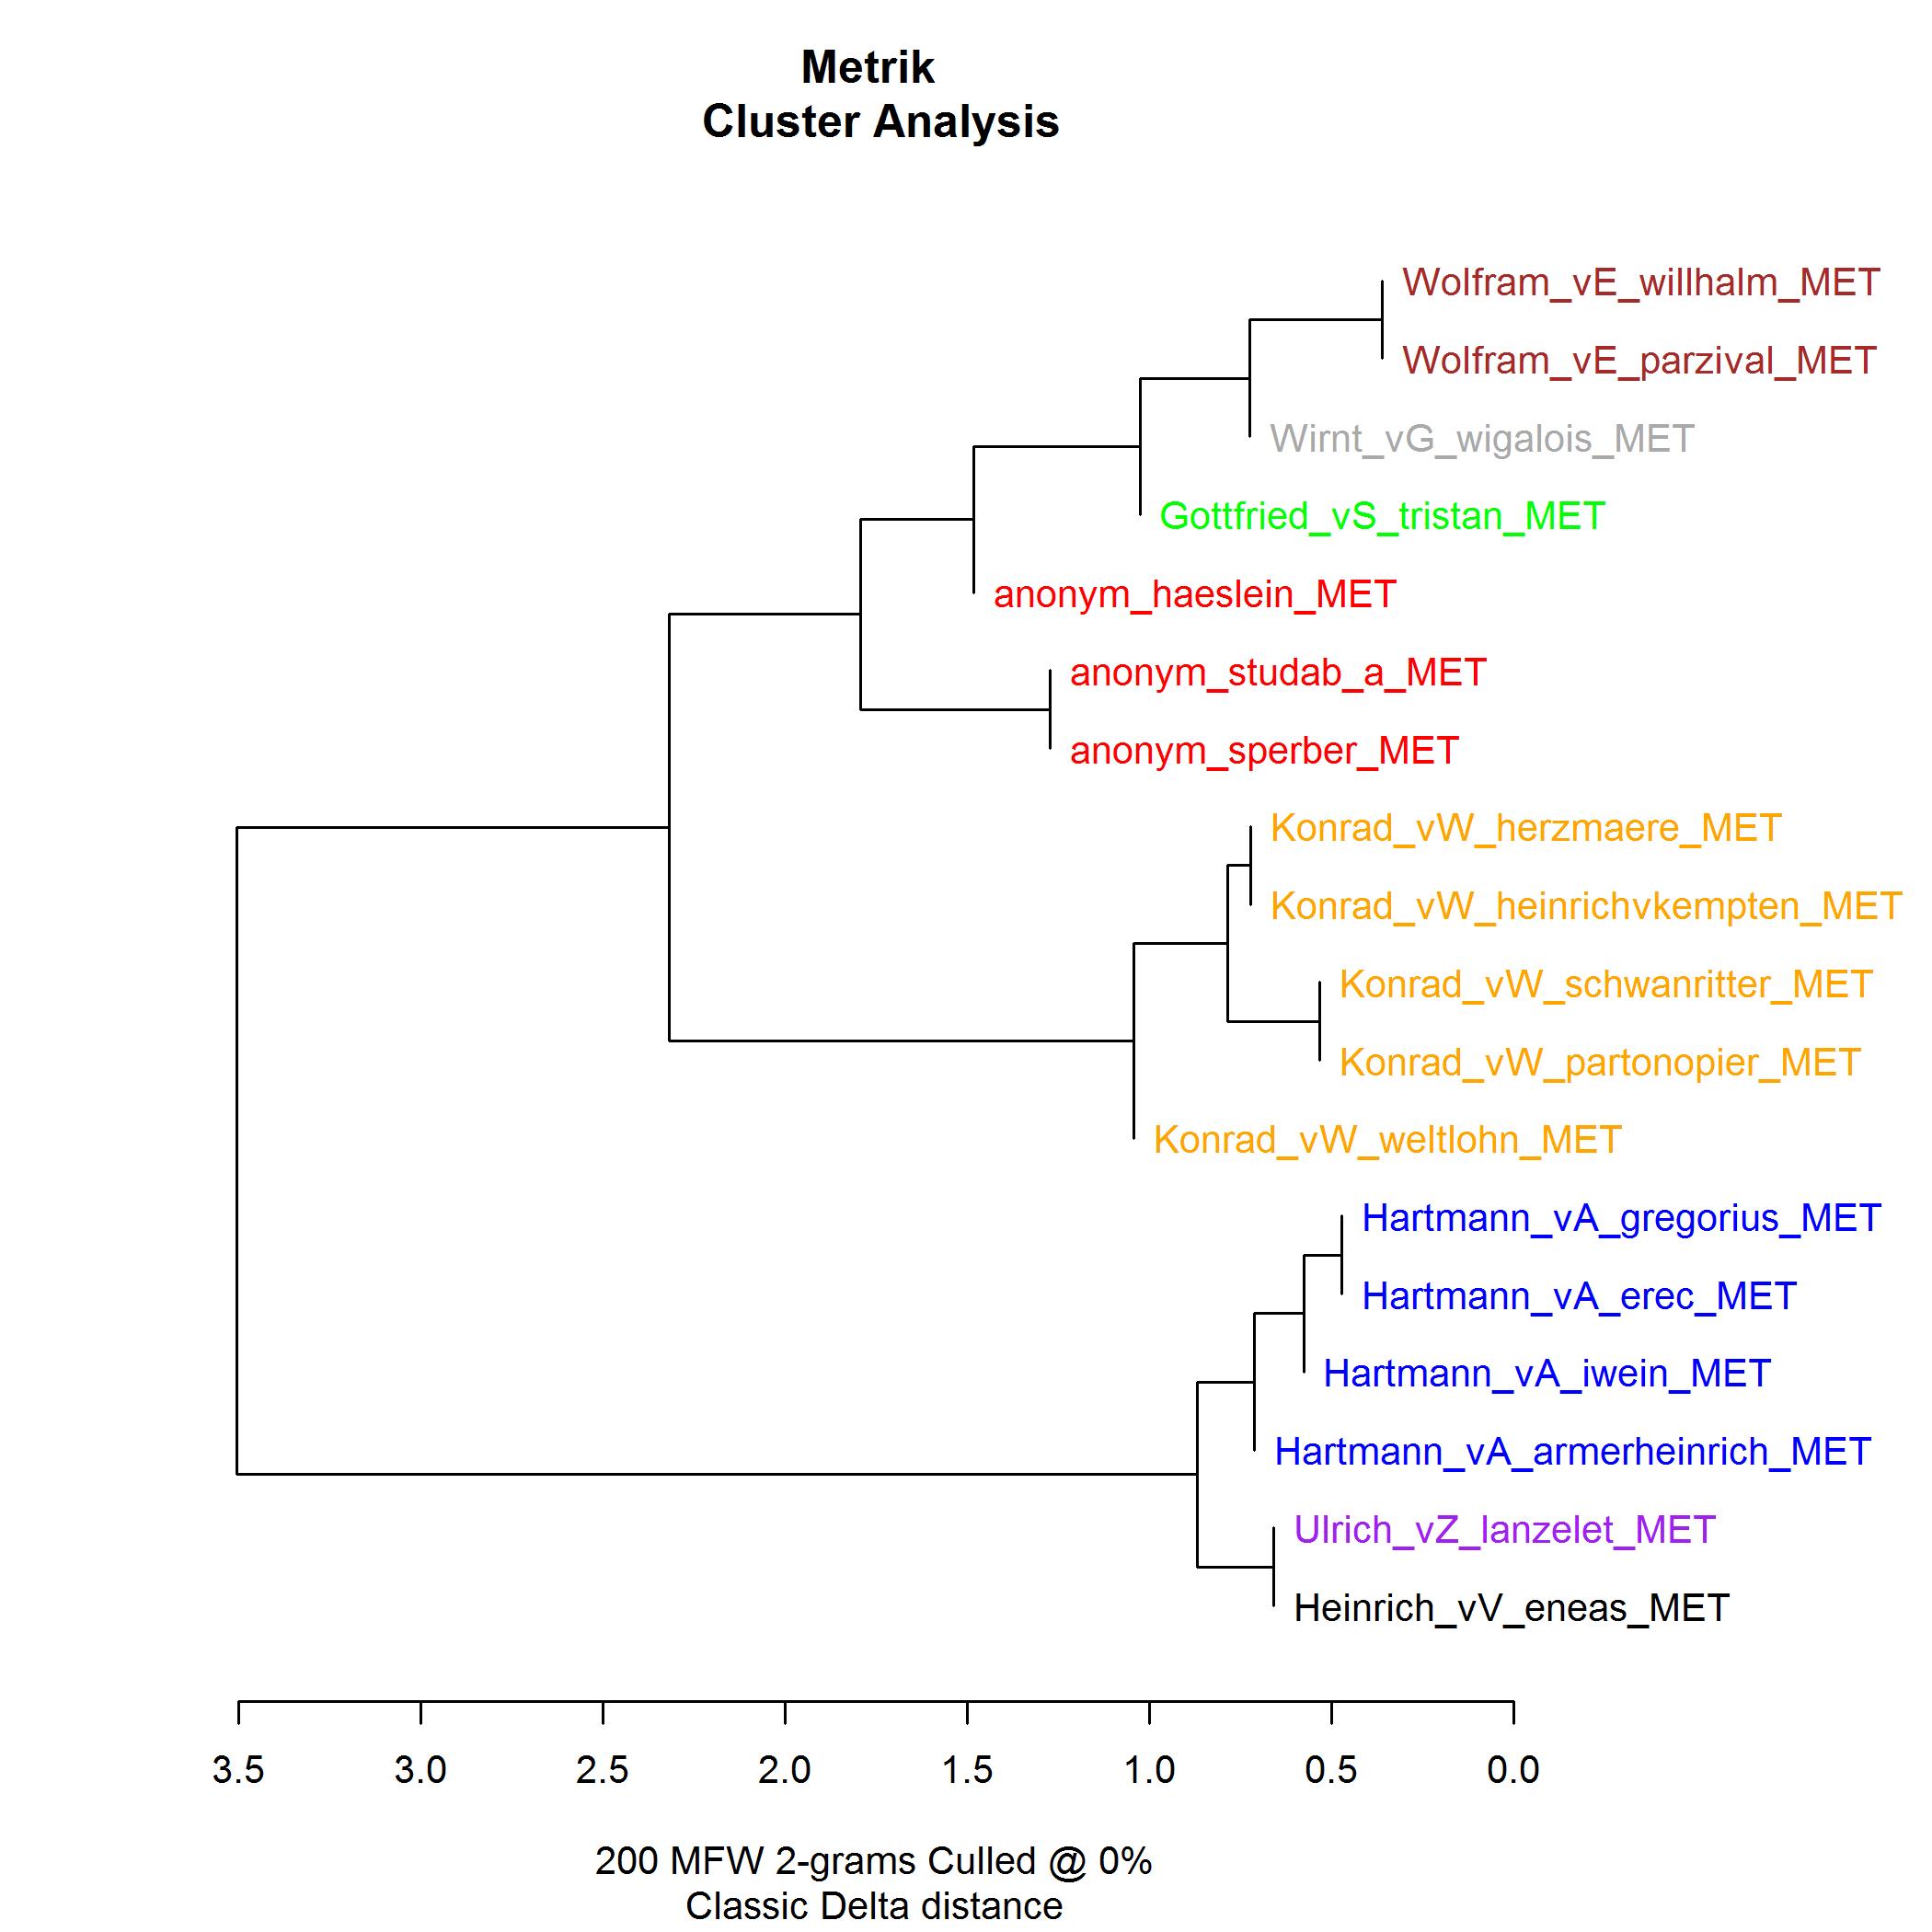 Abb. 22: Stylo-R-Clusteranalyse mit                                    Metrik-Daten I [Friedrich Michael Dimpel, 2017. Lizenziert unter                                    Creative Commons Namensnennung 4.0 International (CC-BY)]